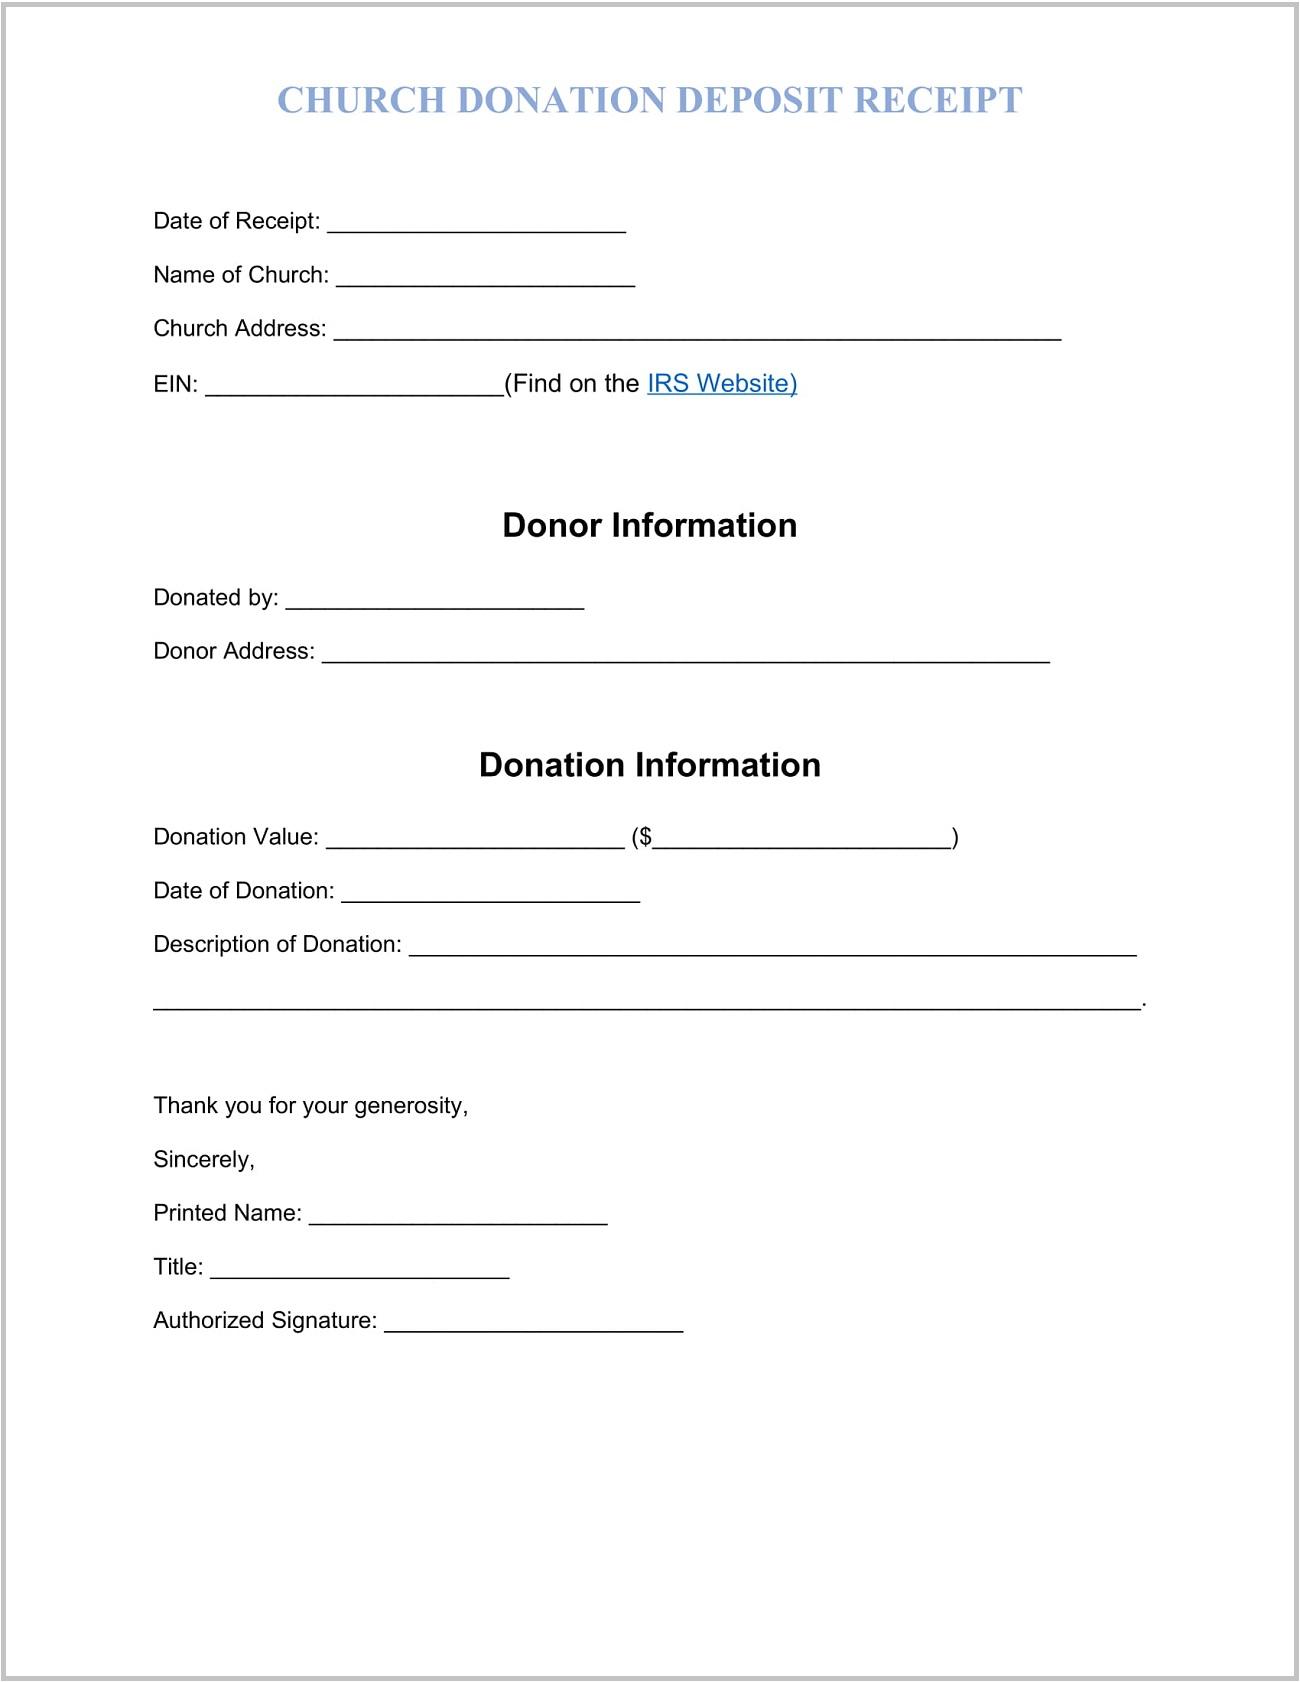 Church Donation Receipt Template Sample